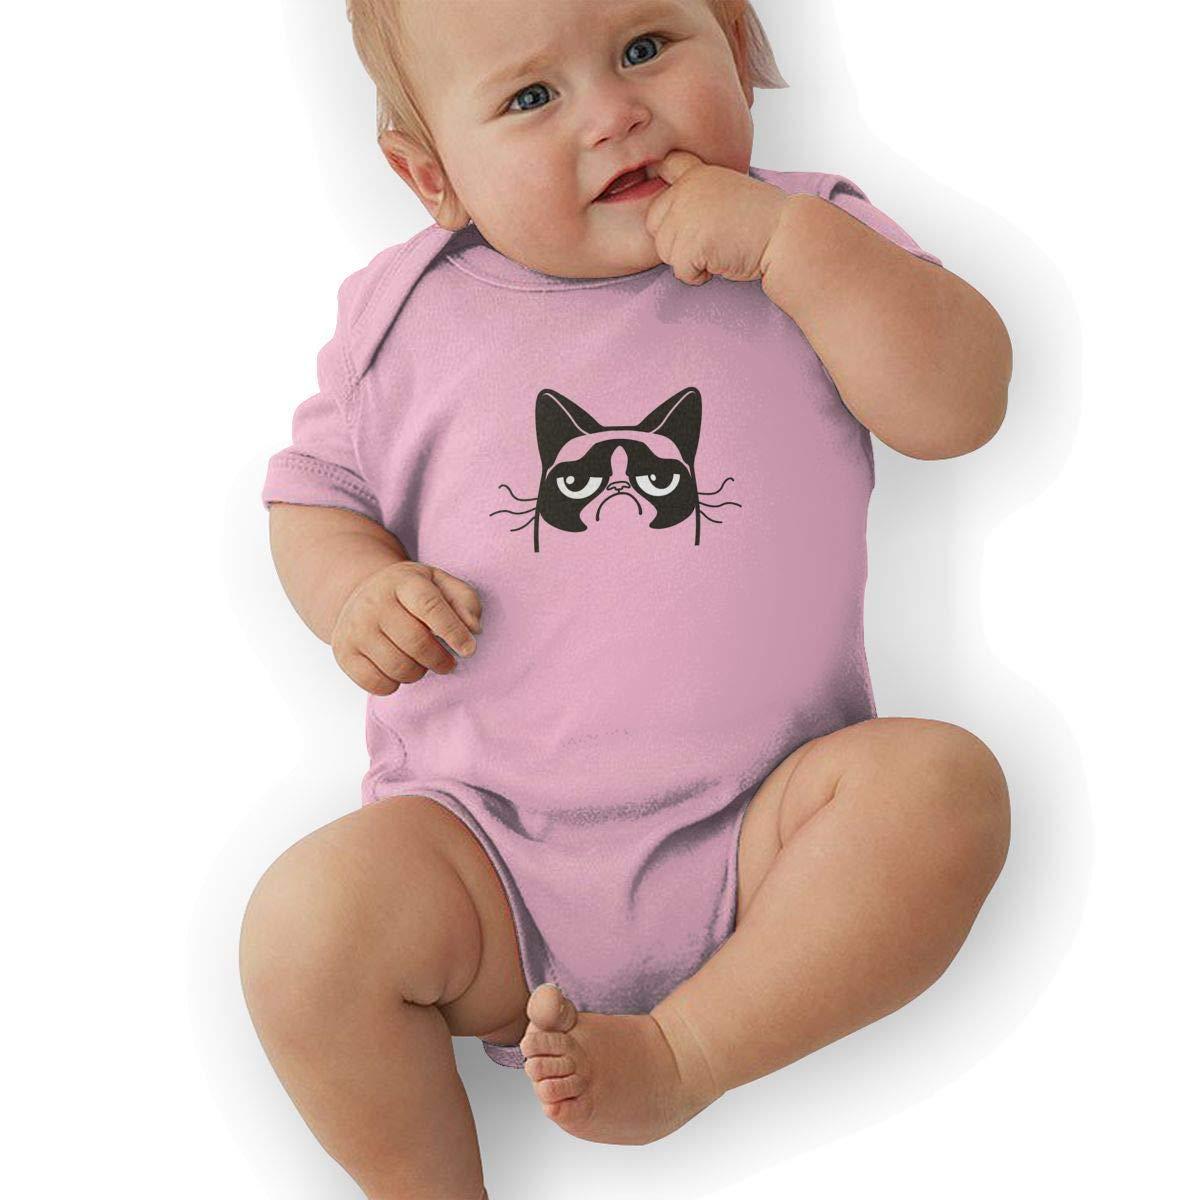 Sad Blue Cat Baby Onesies Toddler Baby Girl//Boy Unisex Clothes Romper Jumpsuit Bodysuit One Piece